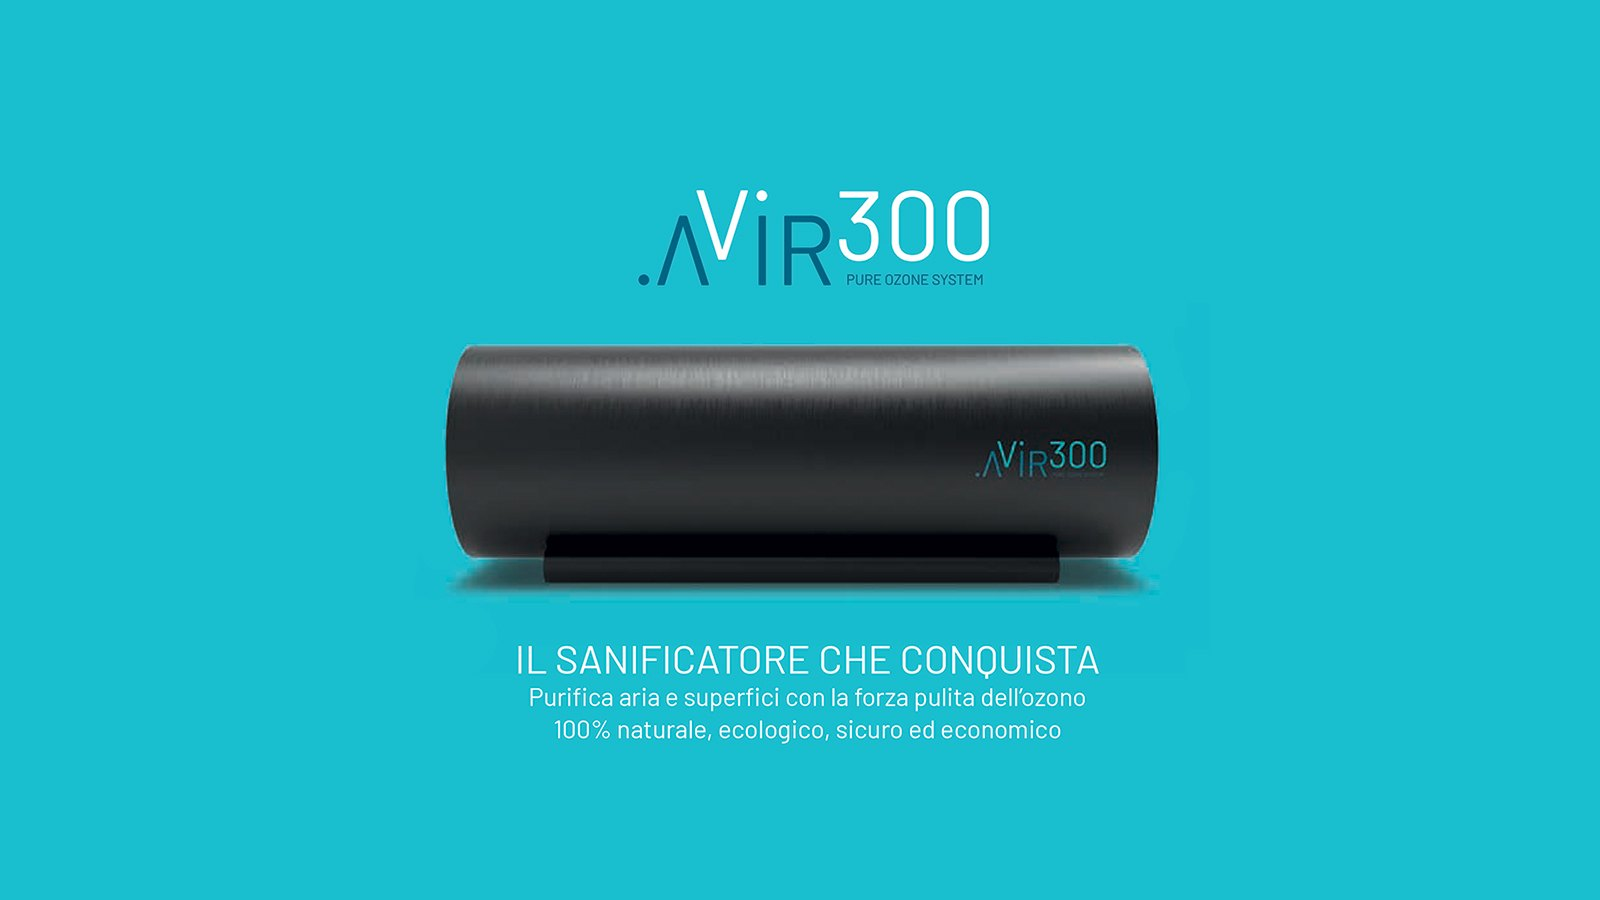 Avir 300